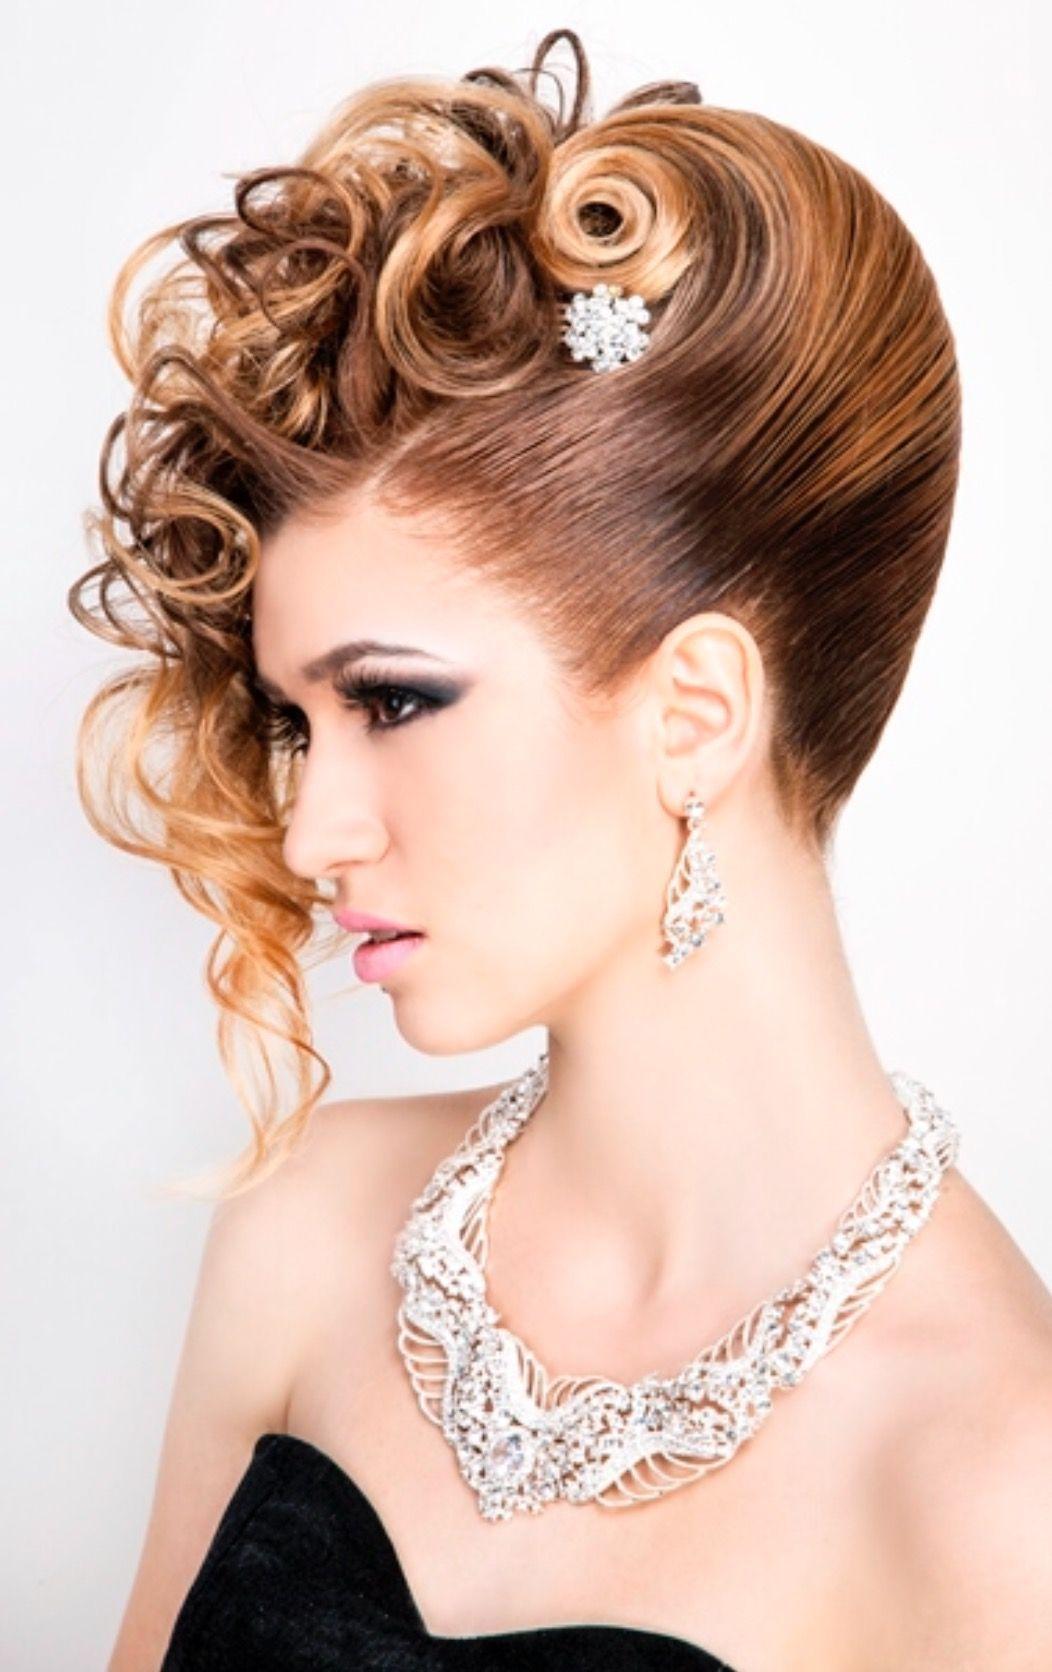 image result for avant garde wedding hair | wedding wish in